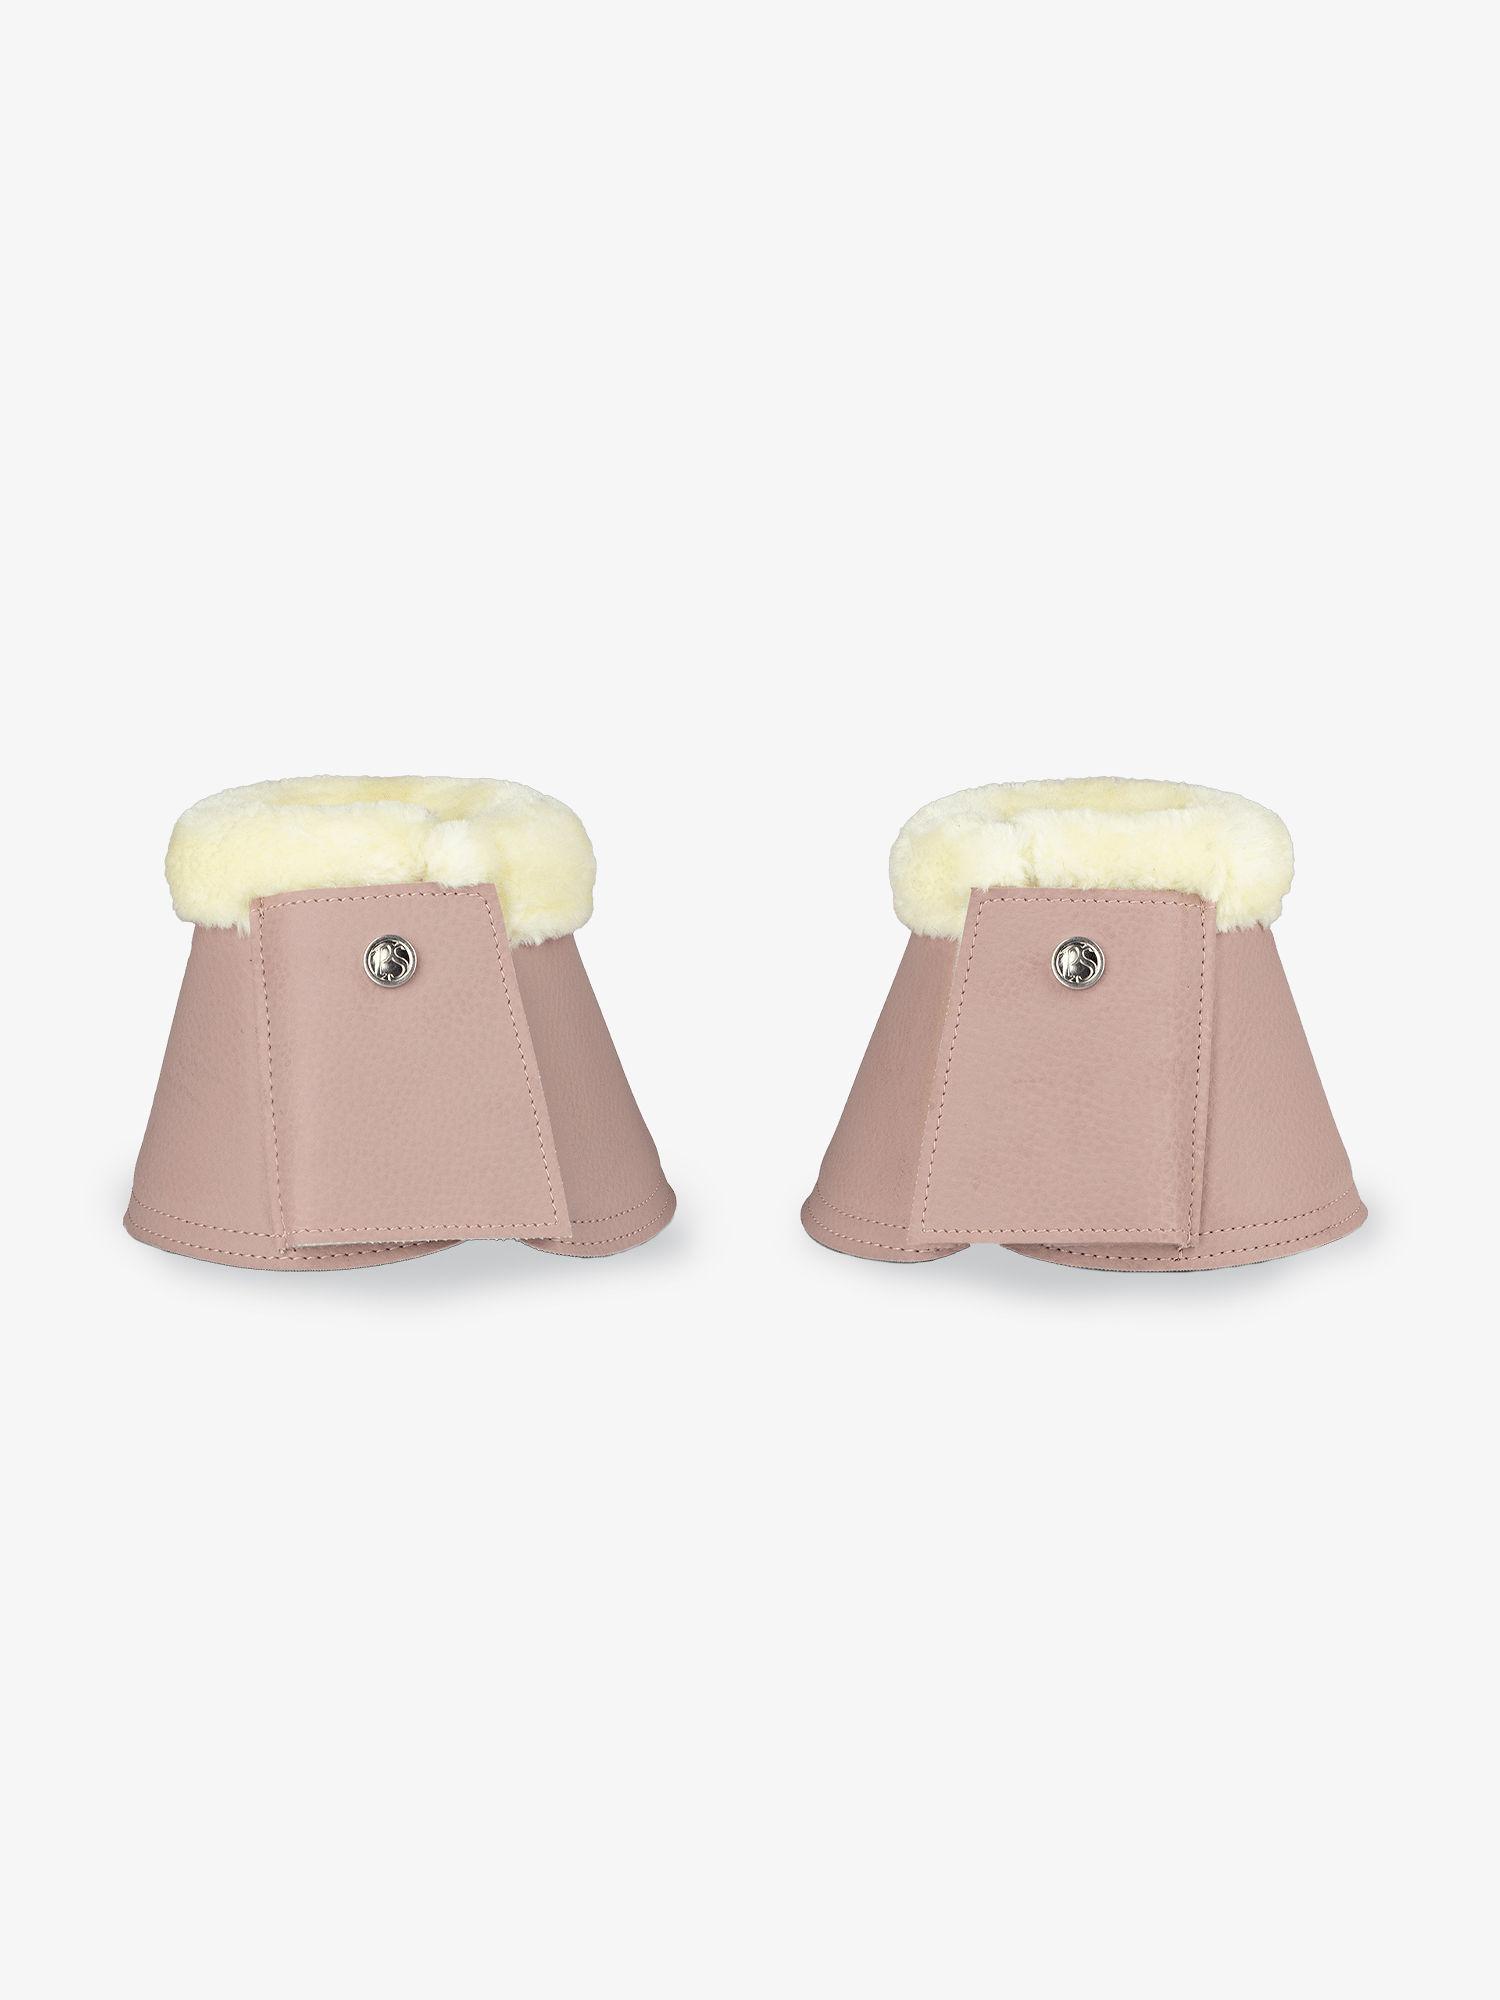 PS of Sweden 2er Set Hufglocken , Bell Boots in Pink